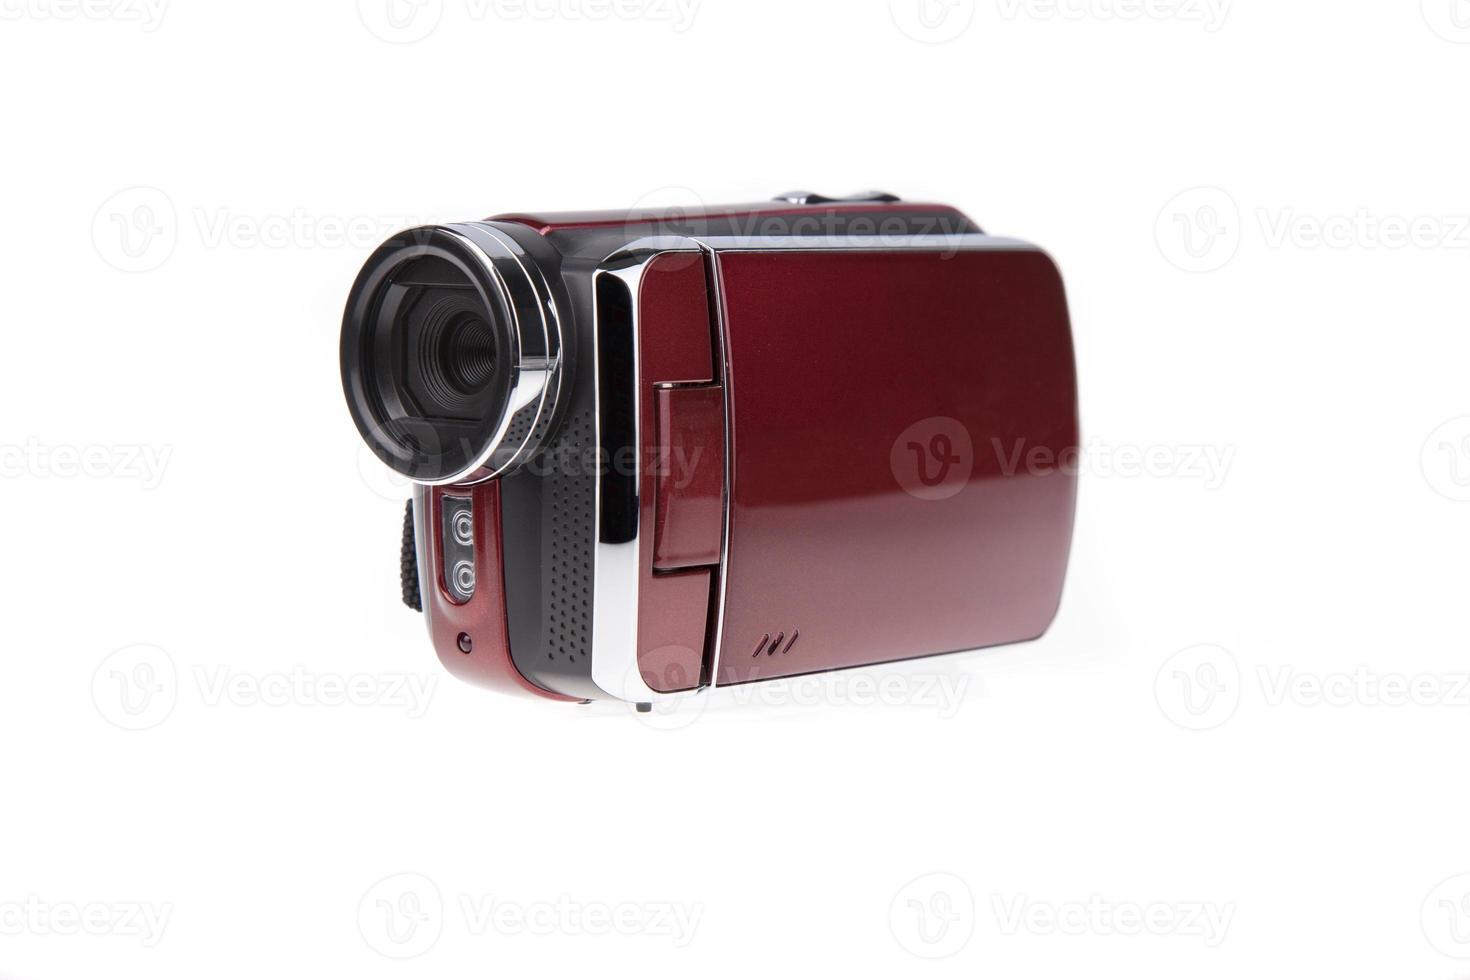 telecamera isolata full hd foto